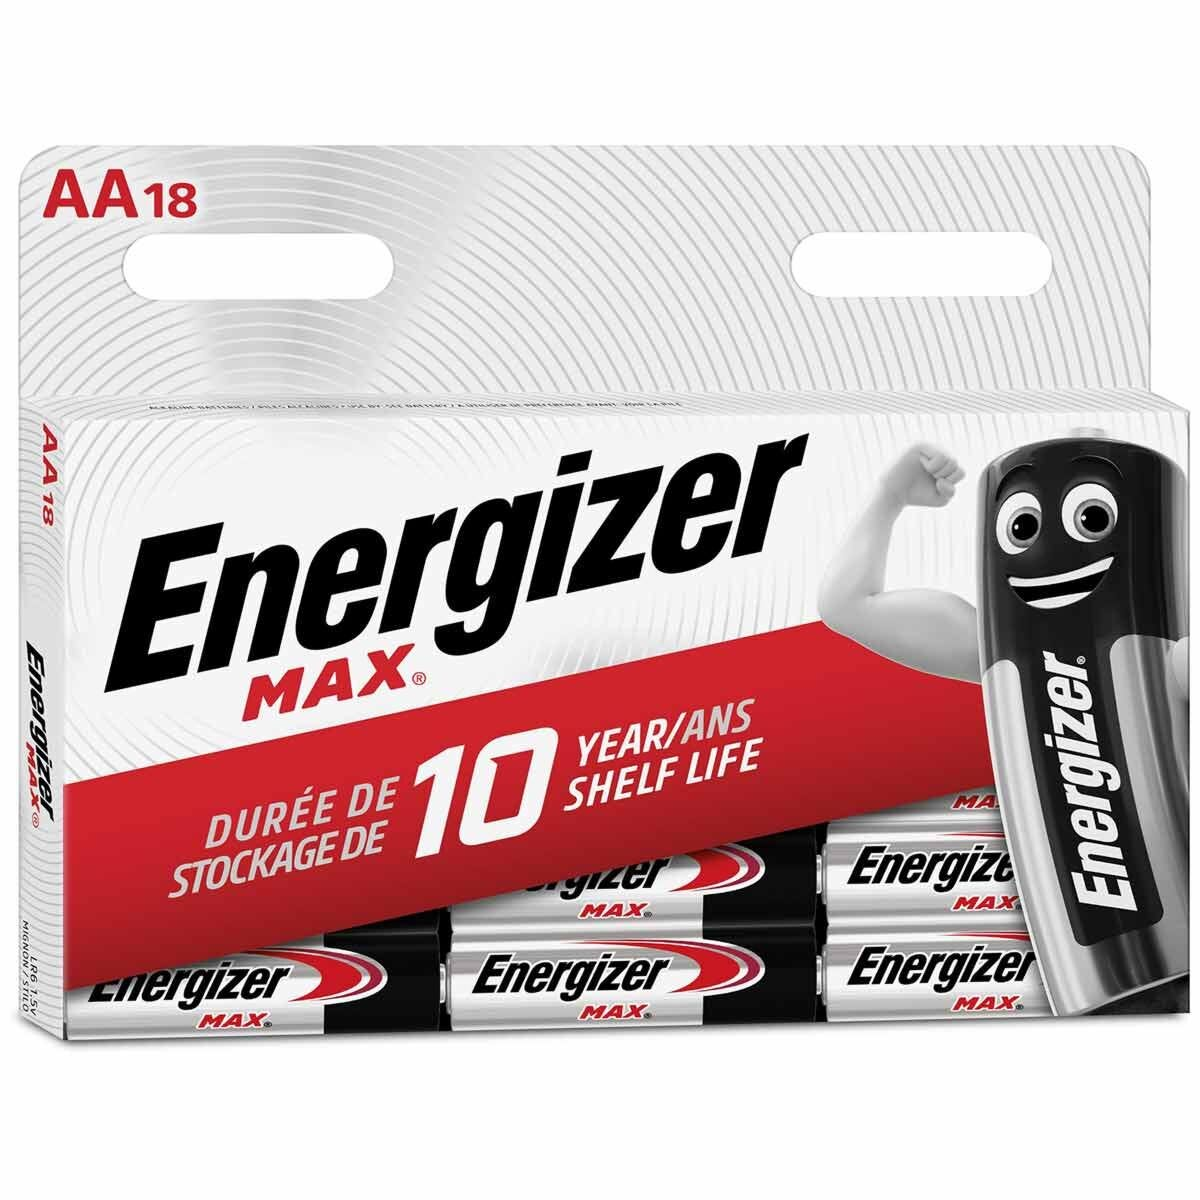 Energizer Max Alkaline AA Batteries Pack of 18